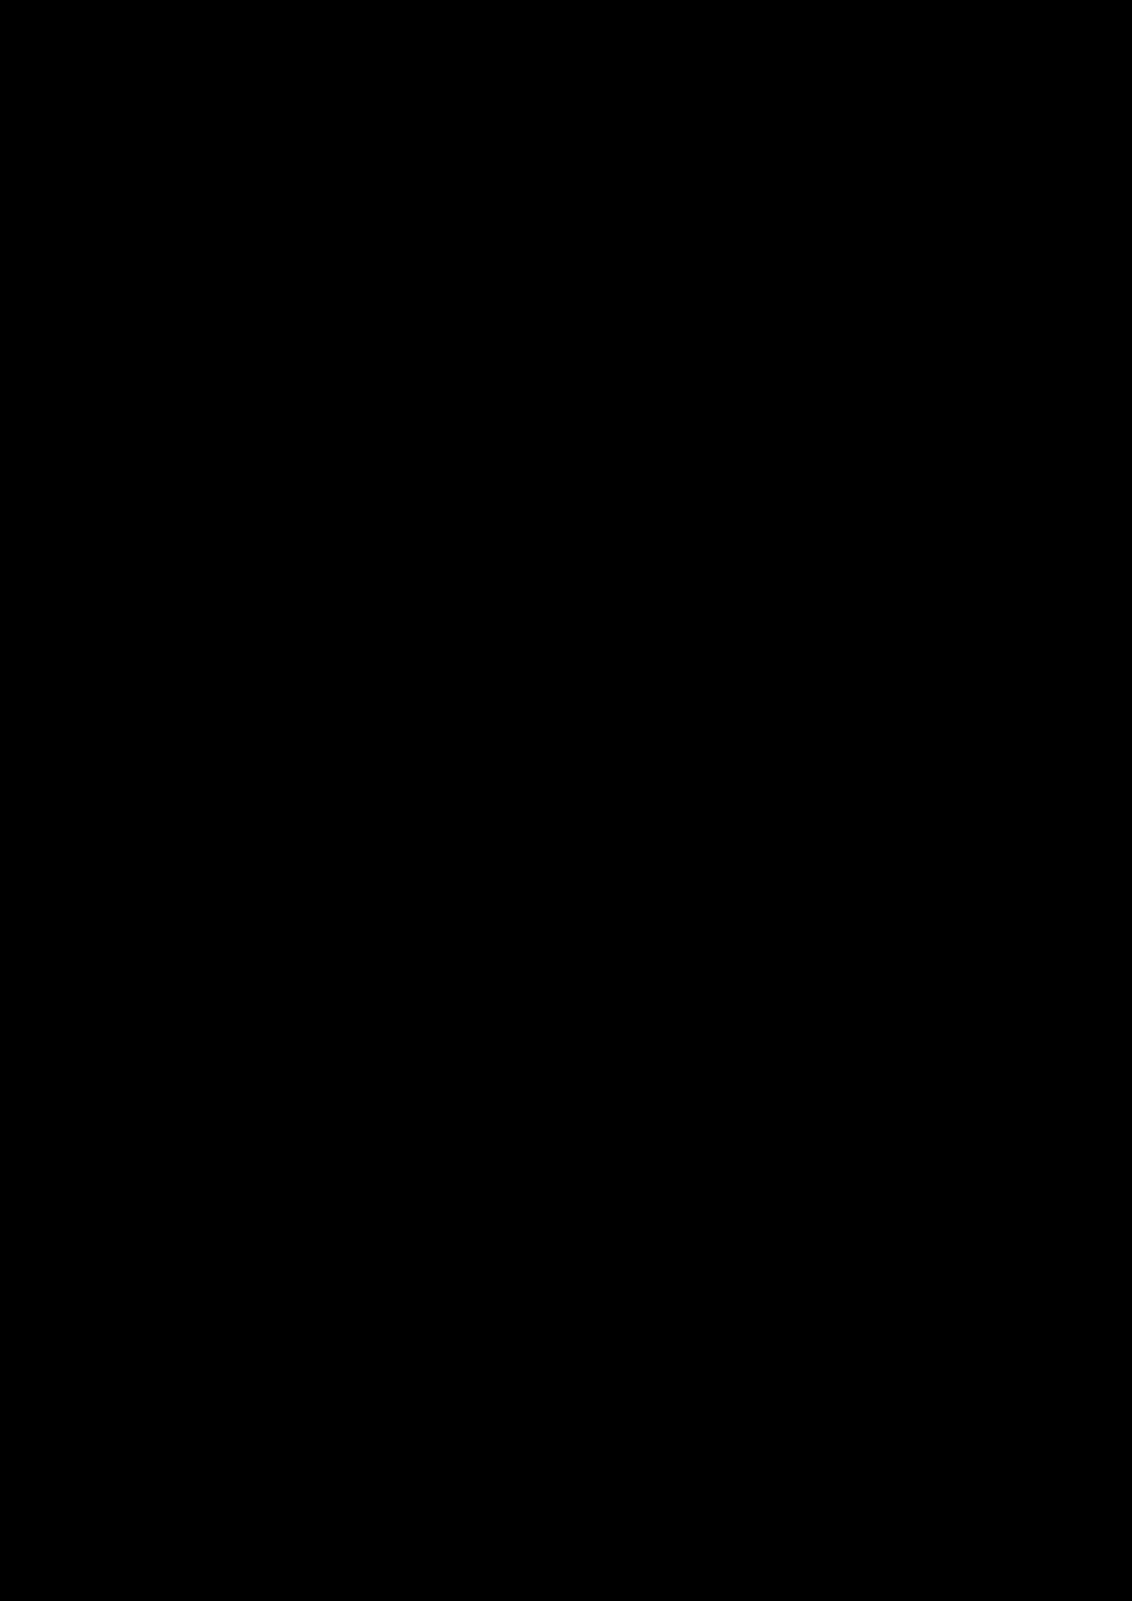 Belyiy sokol slide, Image 168